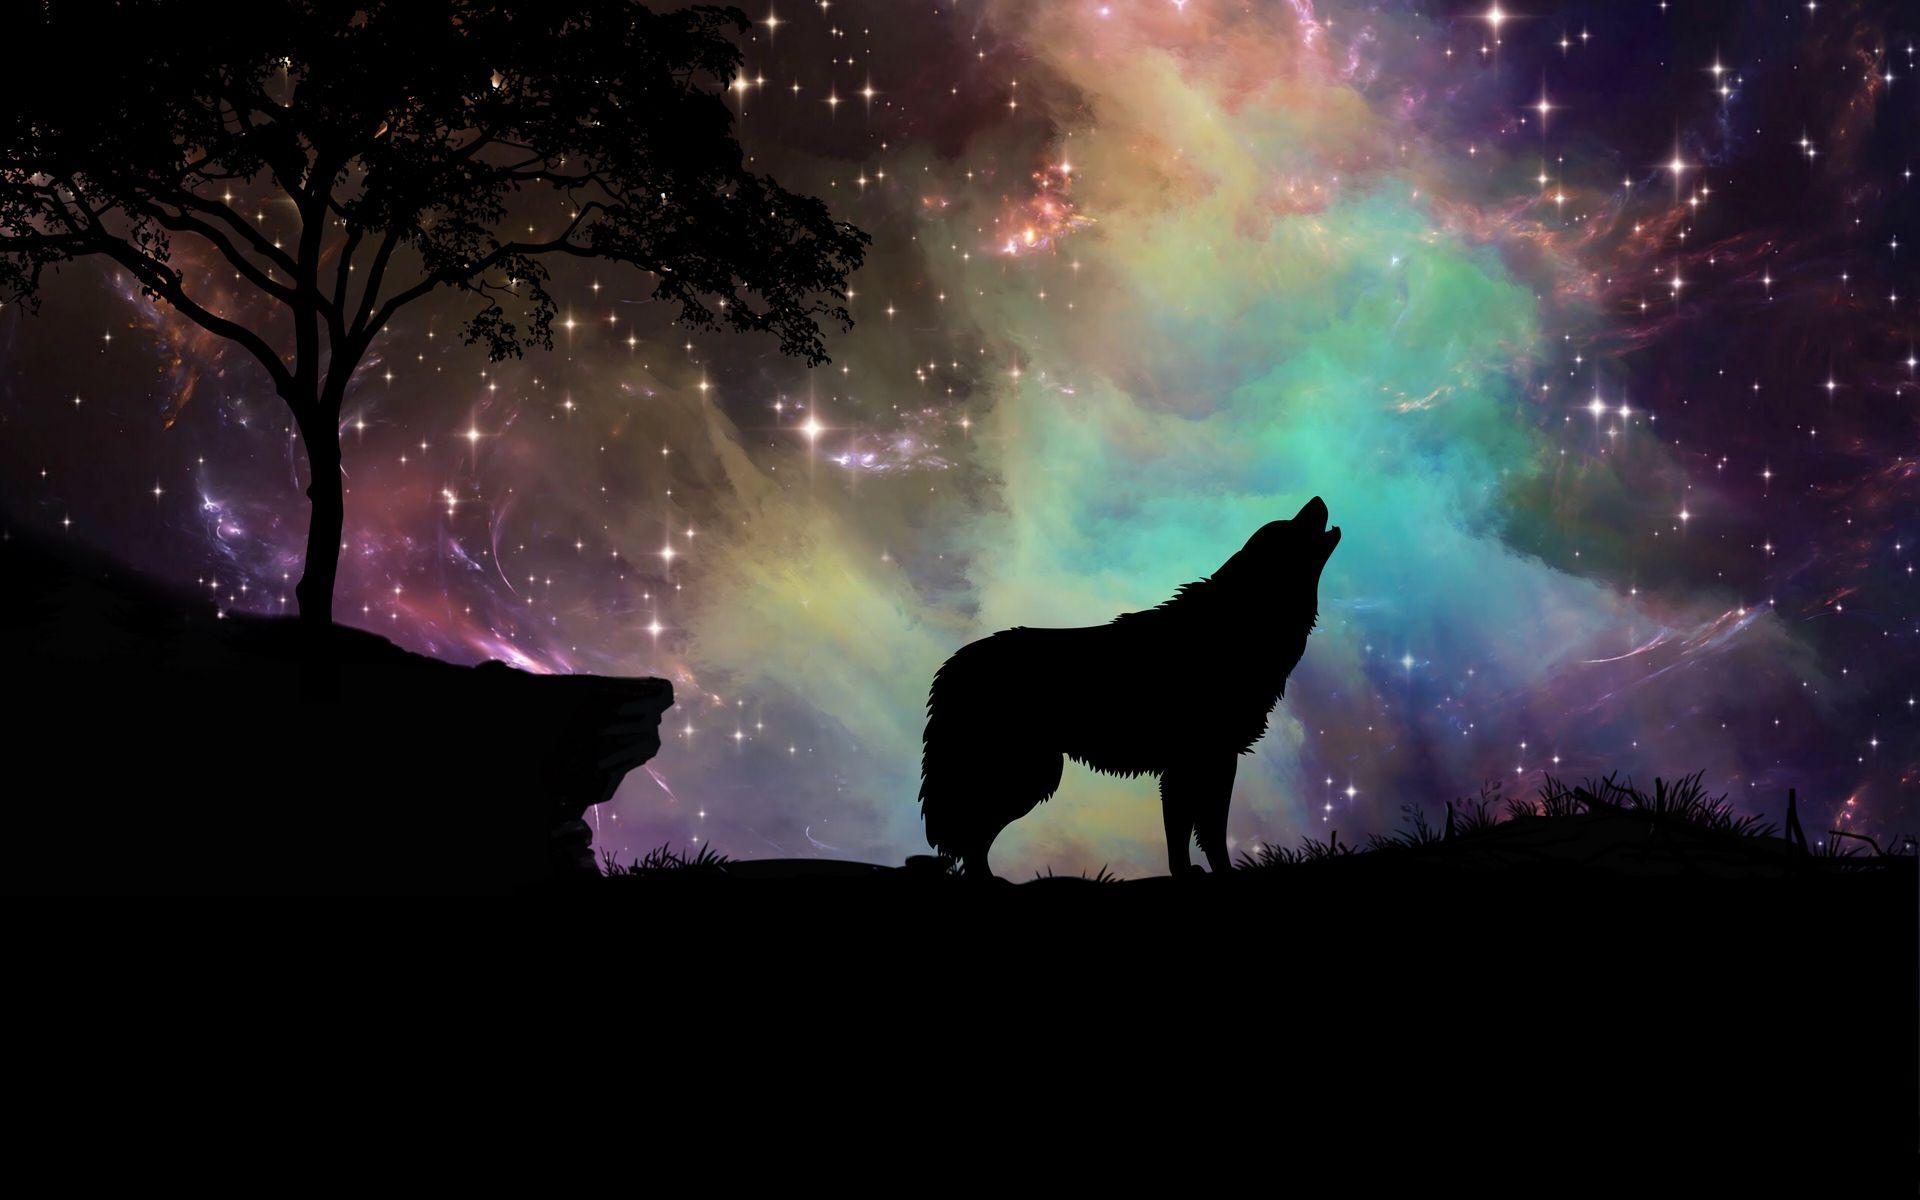 1920x1200 Wallpaper wolf, starry sky, silhouette, art